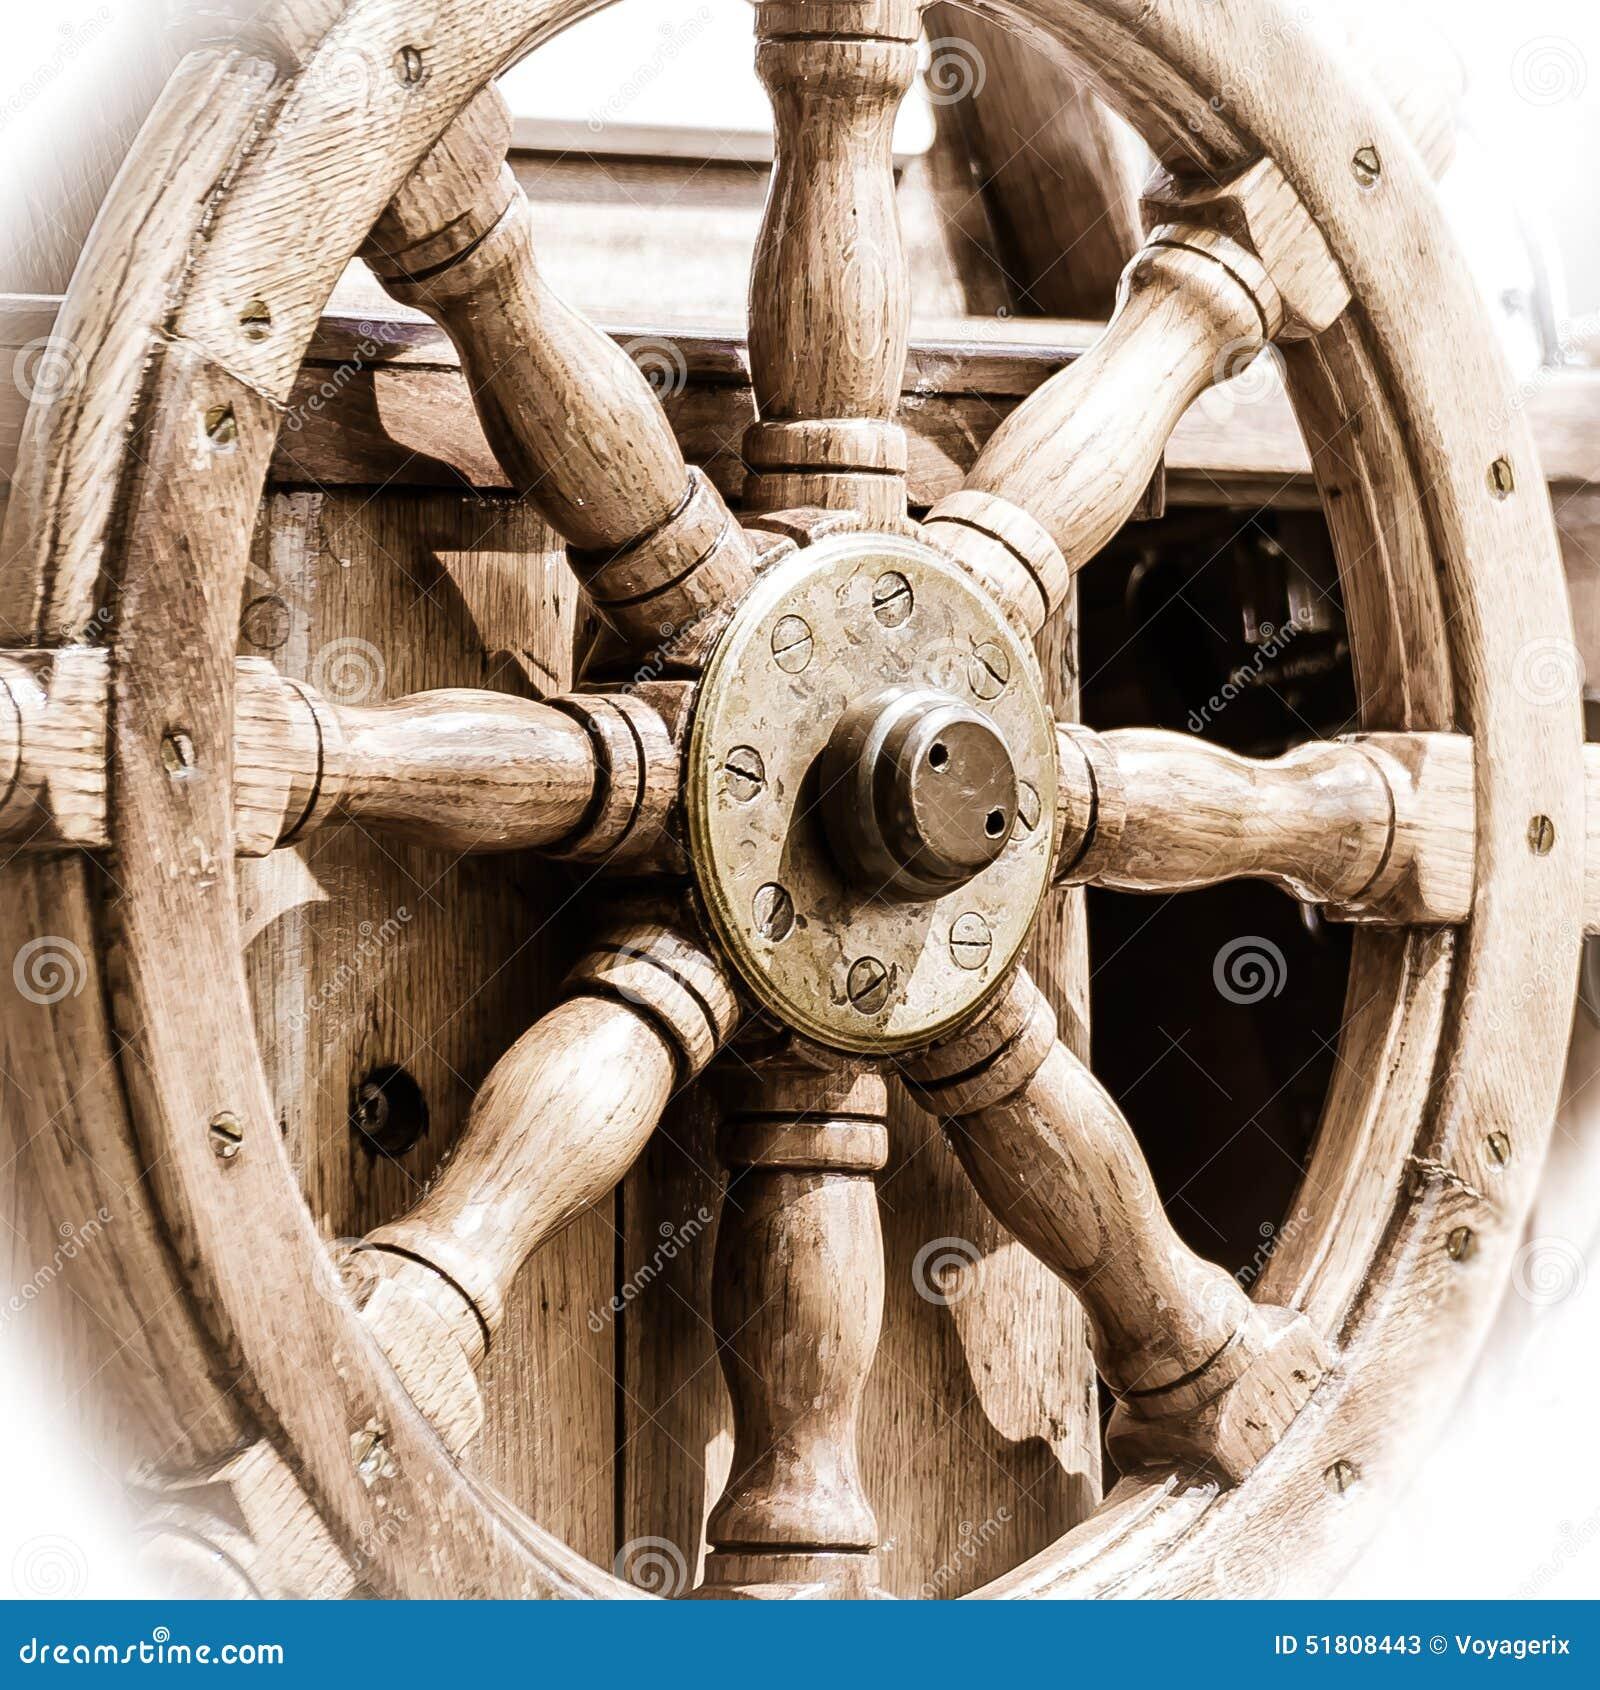 Yachting. Ship Wooden Steering Wheel. Sailboat Detail